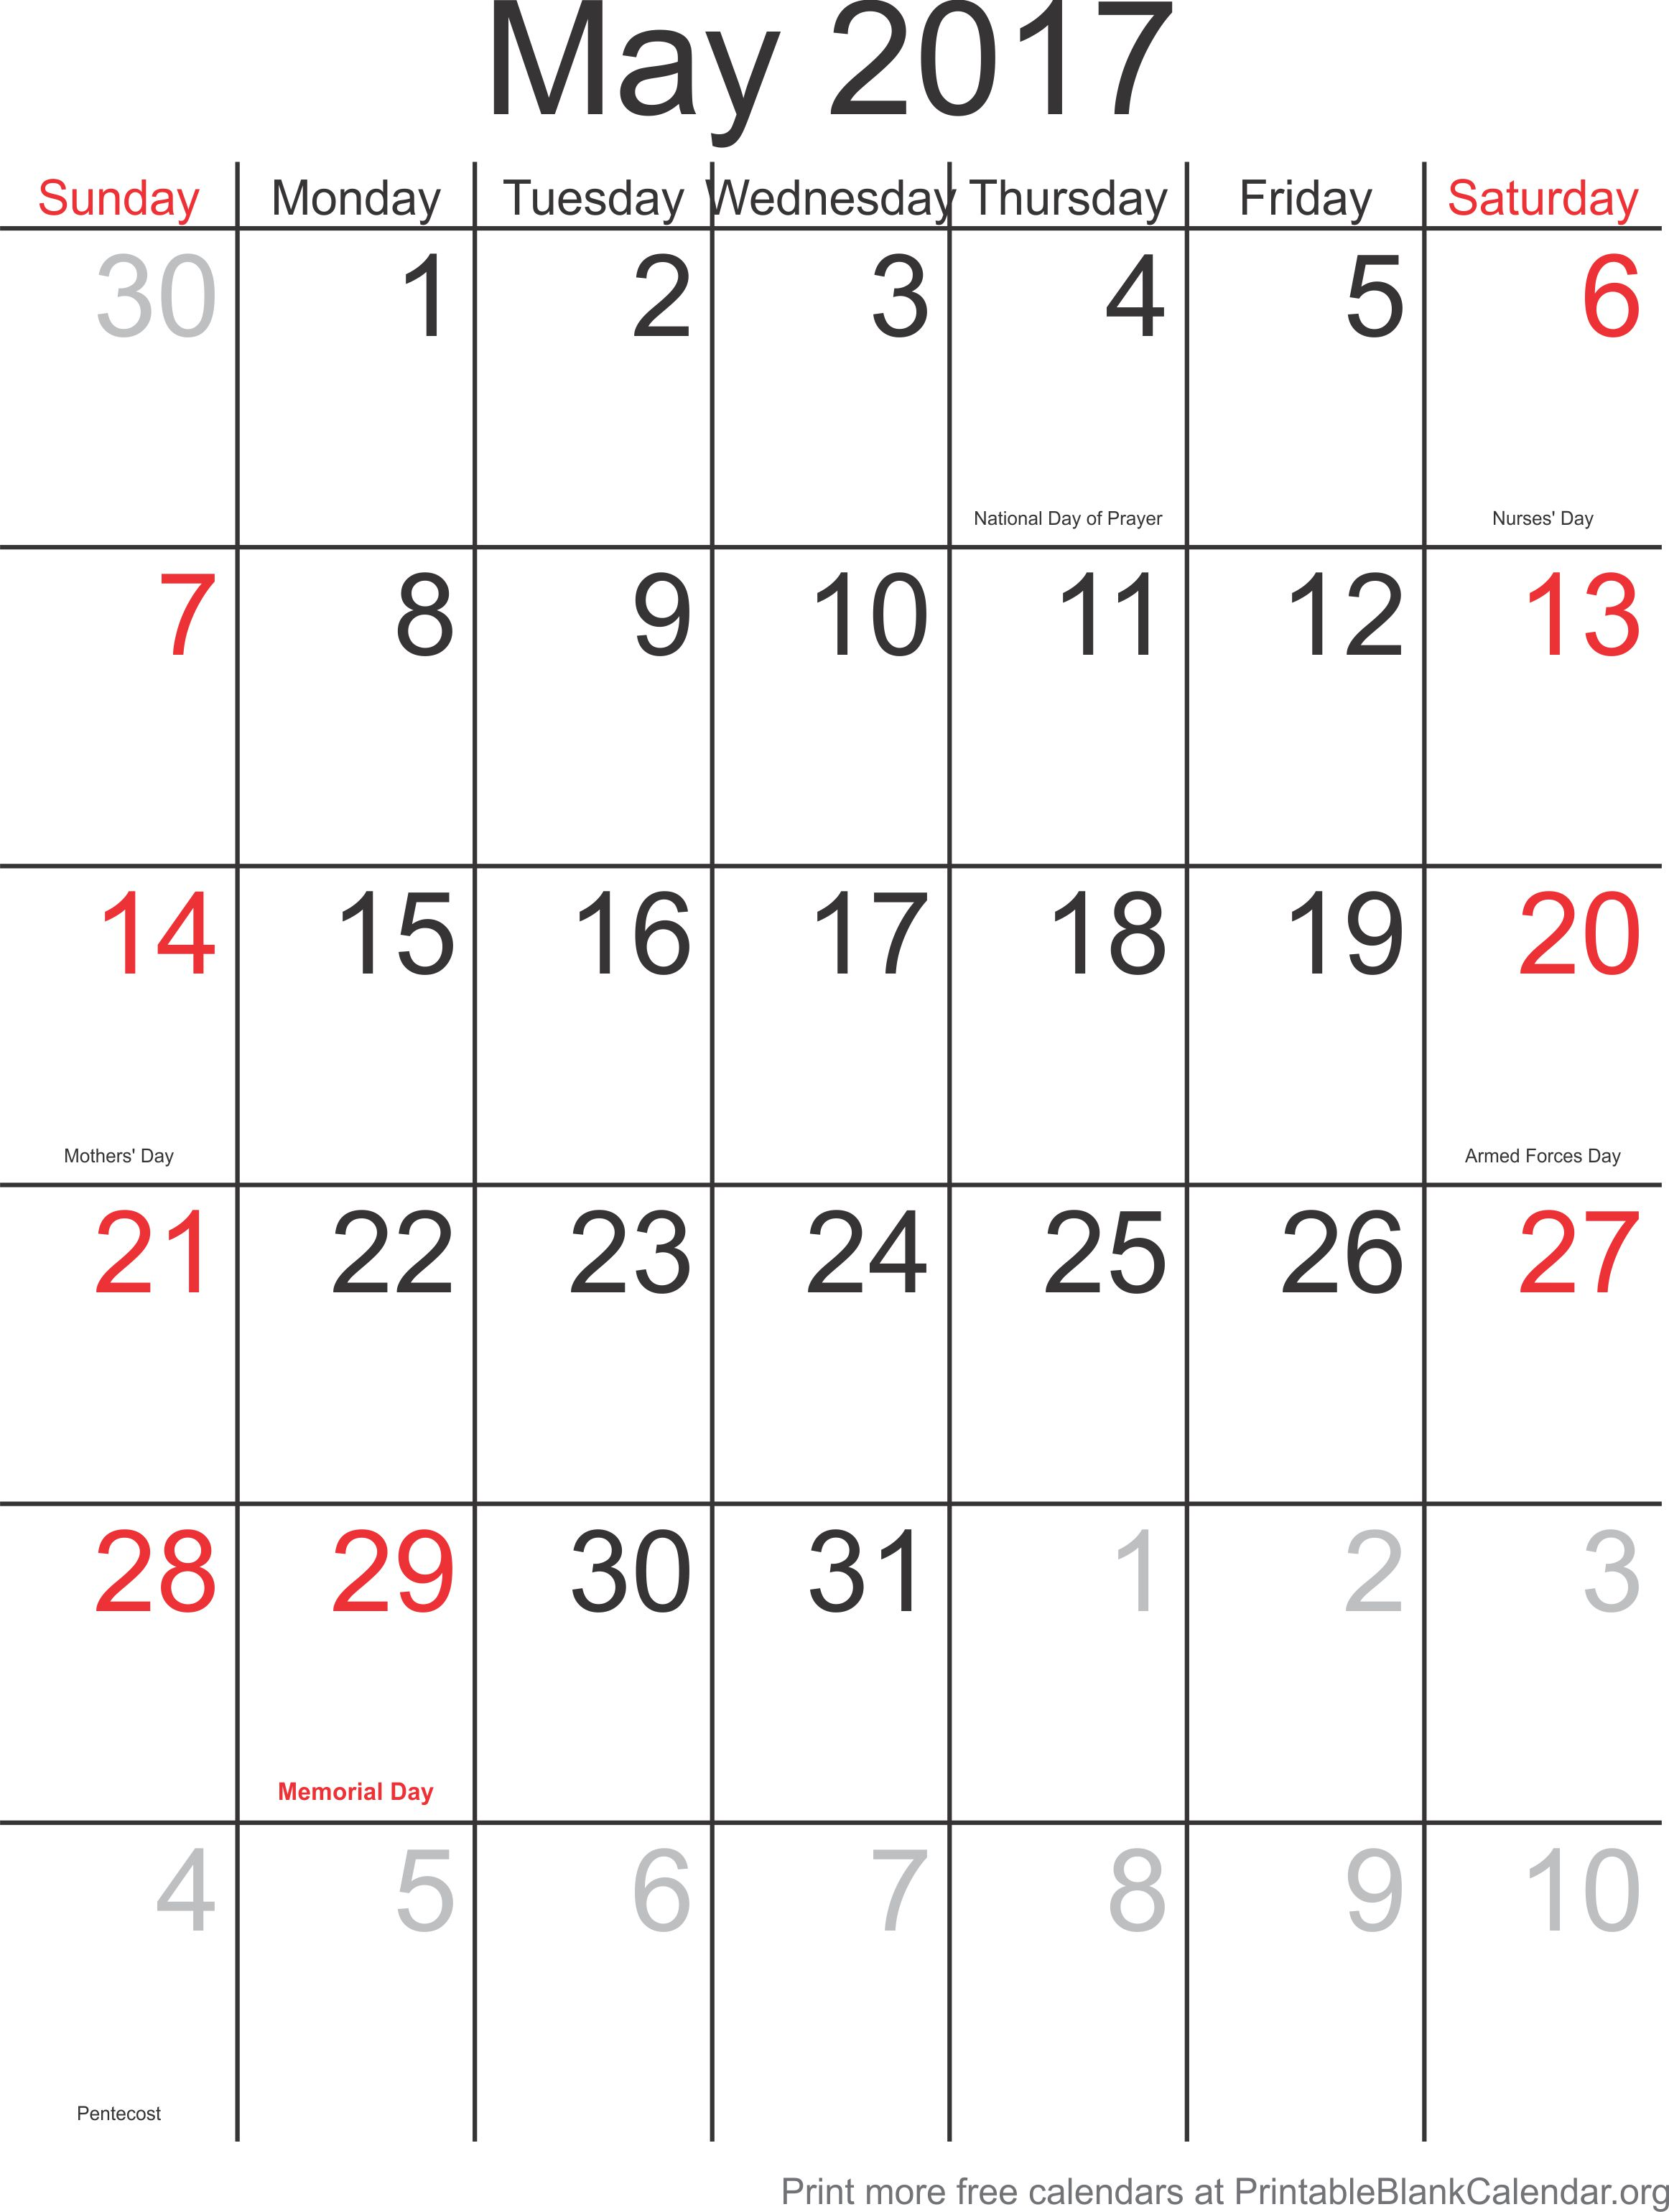 May Calendar Days : Free calendar may printable blank